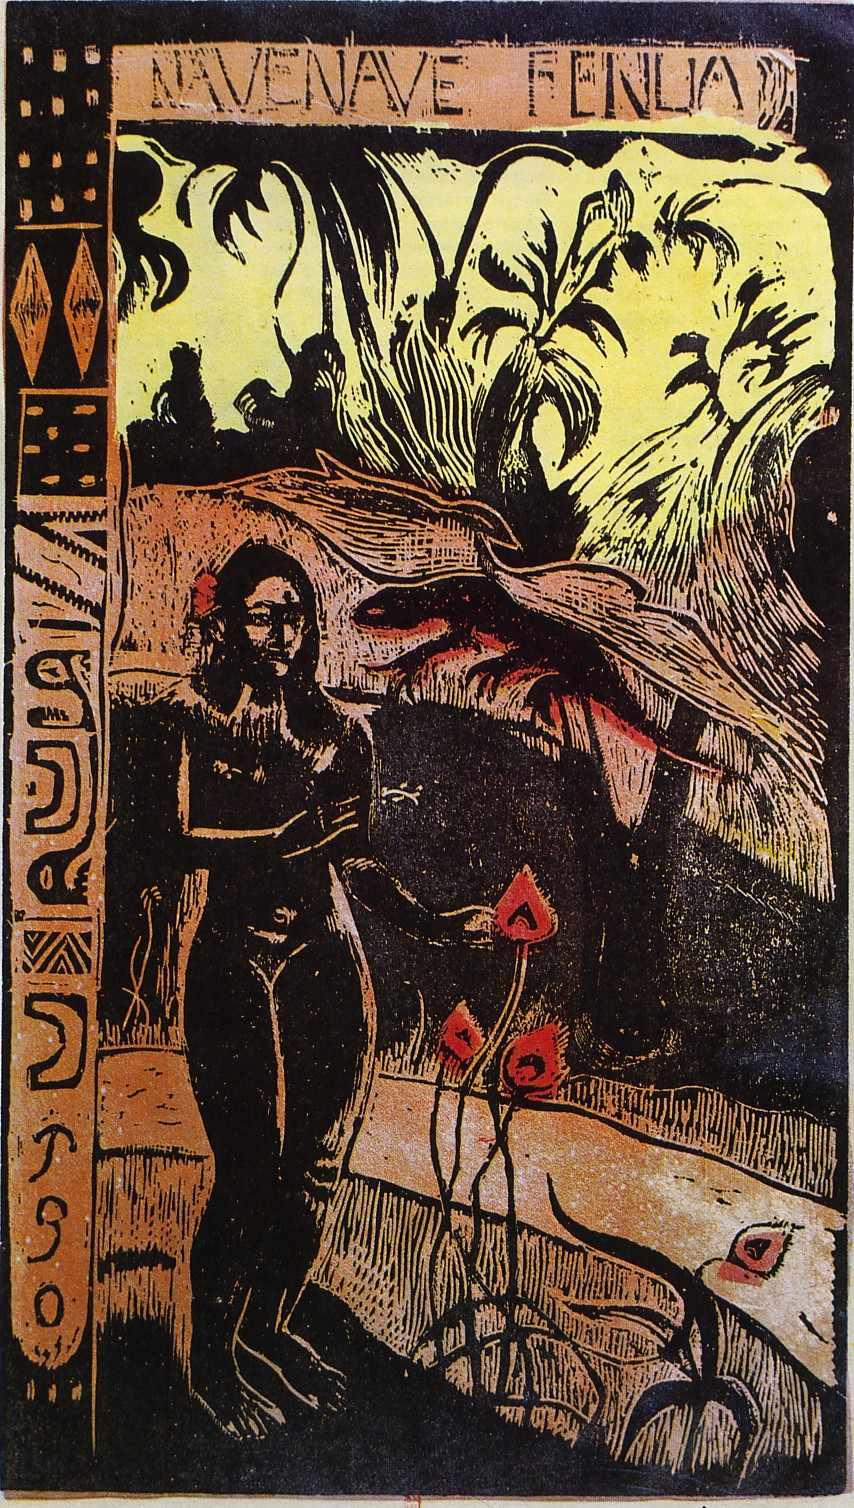 Paul Gauguin: Nave Nave Fenua